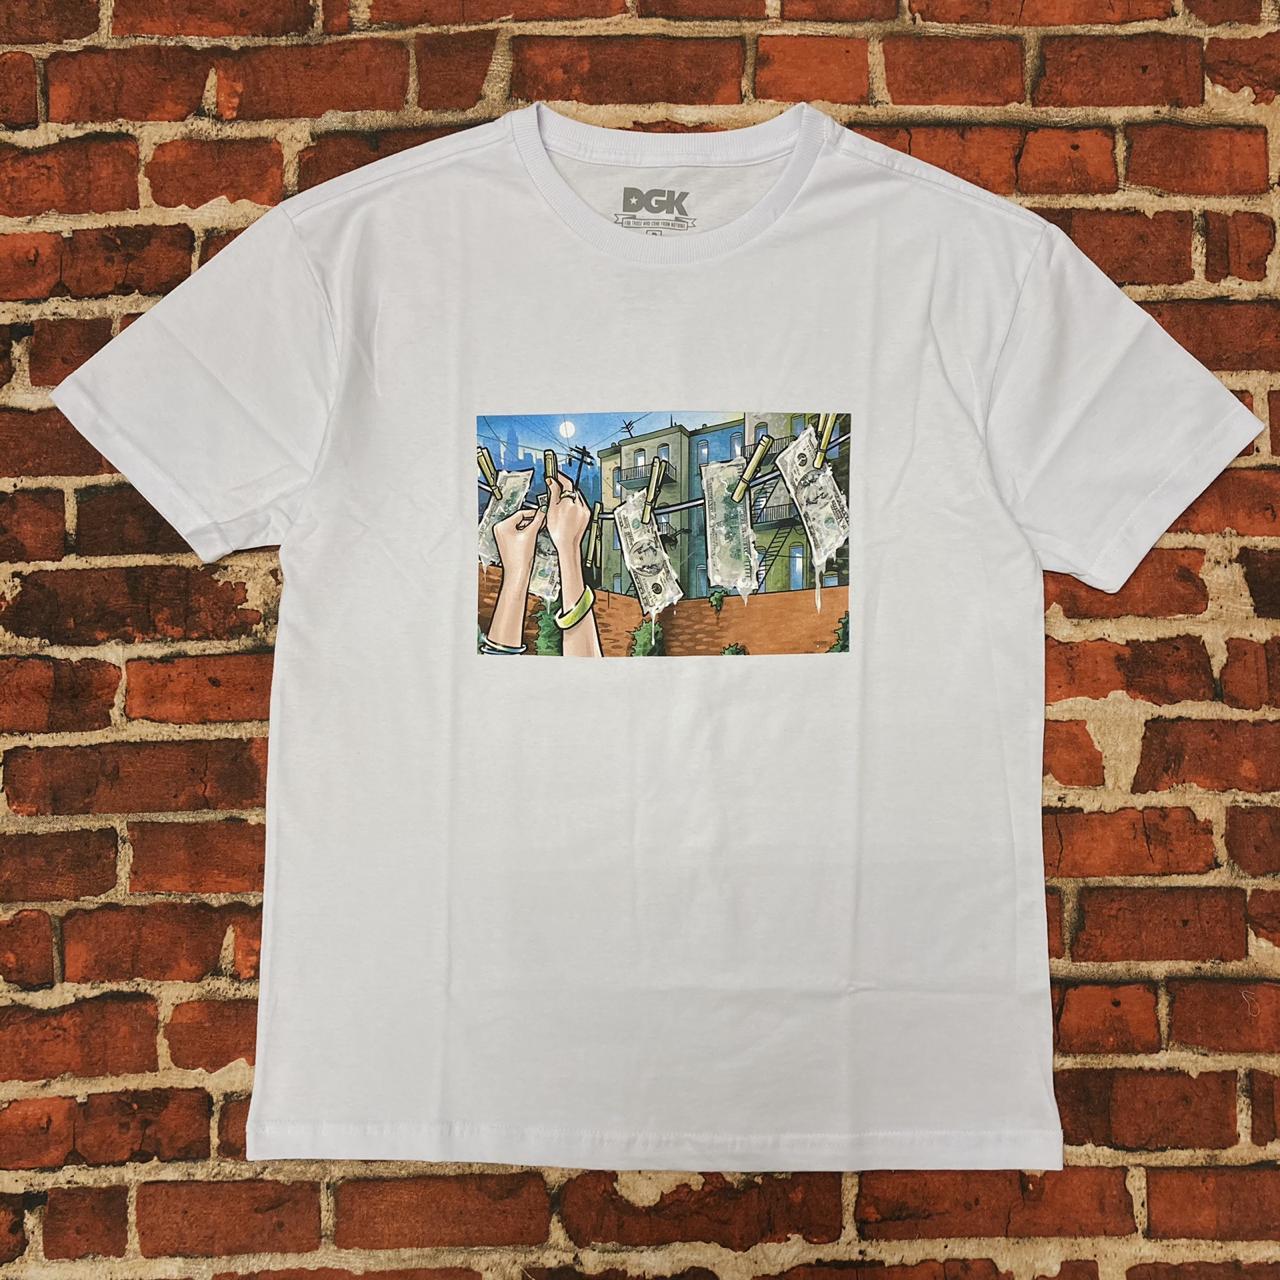 Camiseta dgk laundry white